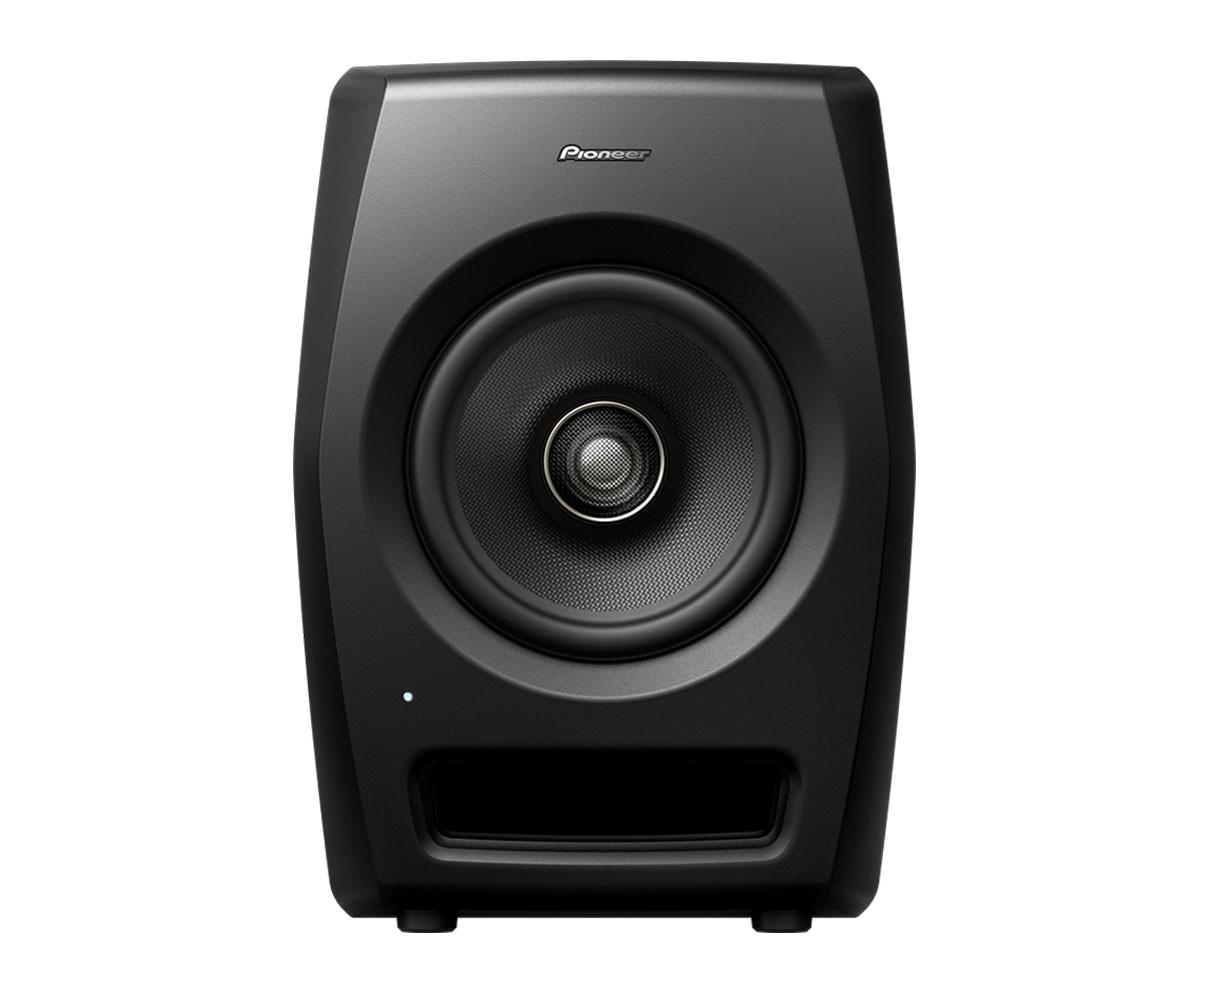 Pioneer RM-07